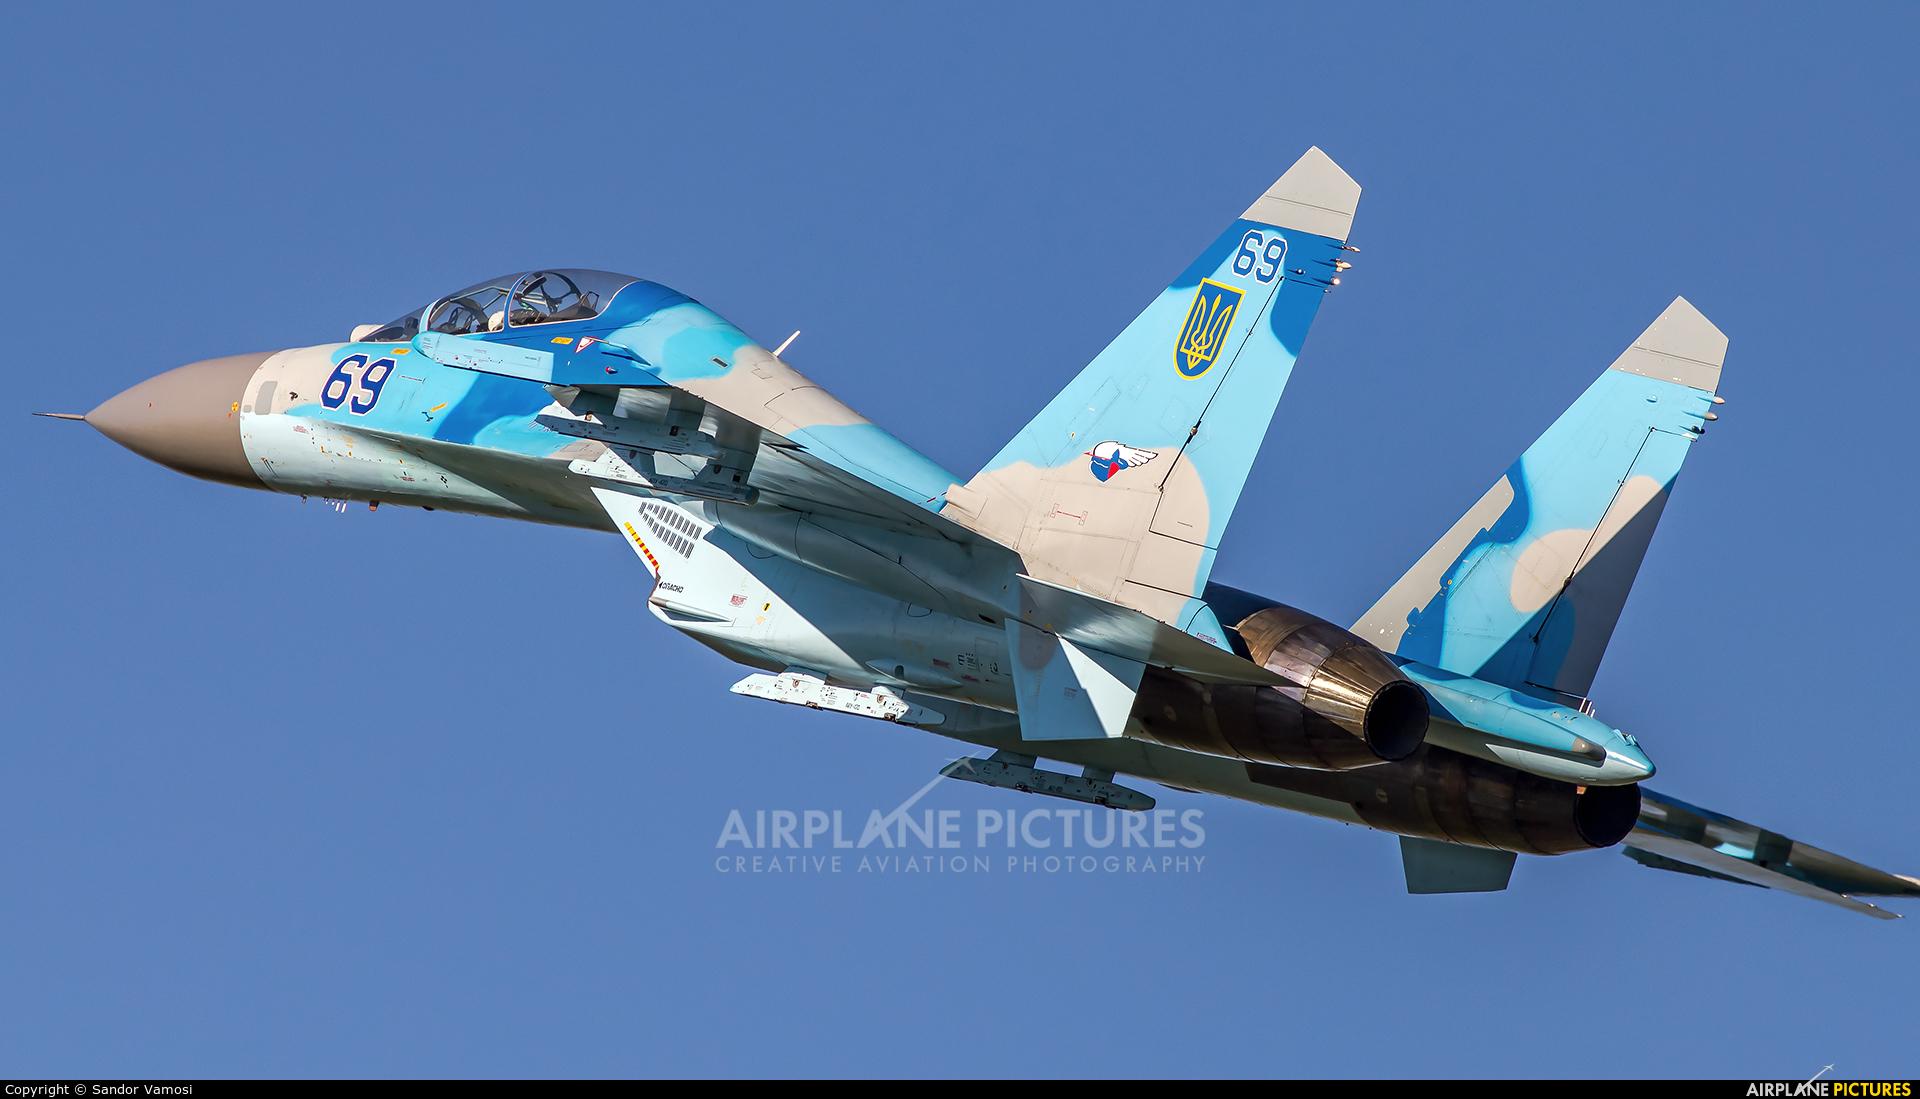 Ukraine - Air Force 69 aircraft at Hradec Králové